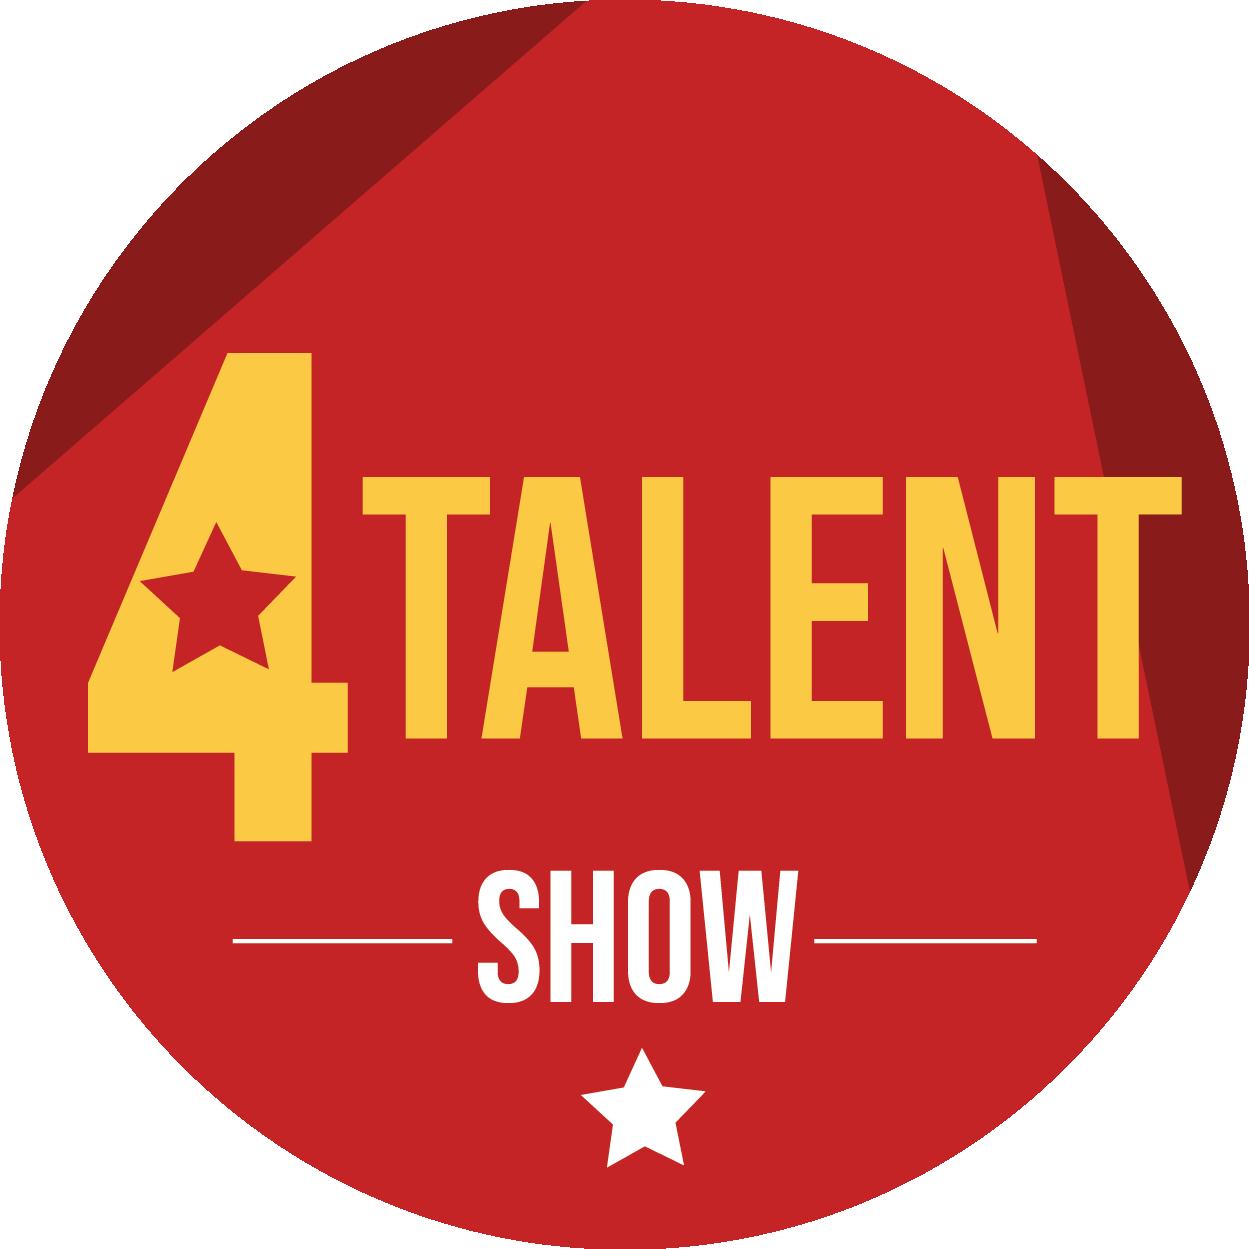 4Talent Show